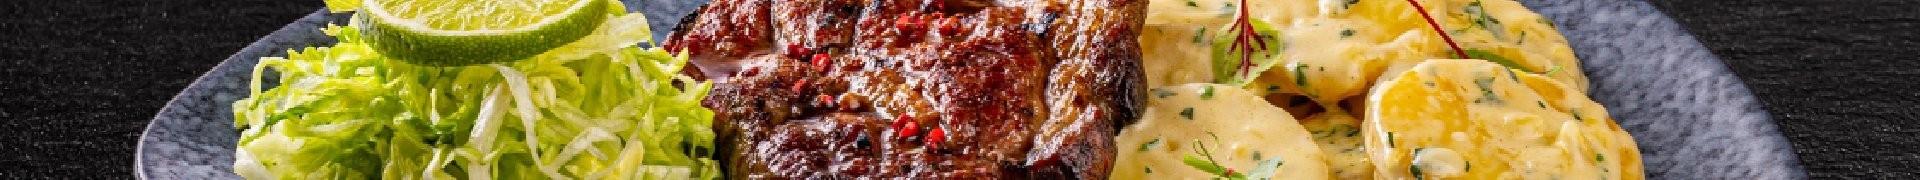 Porc Mangalița congelat / fresh